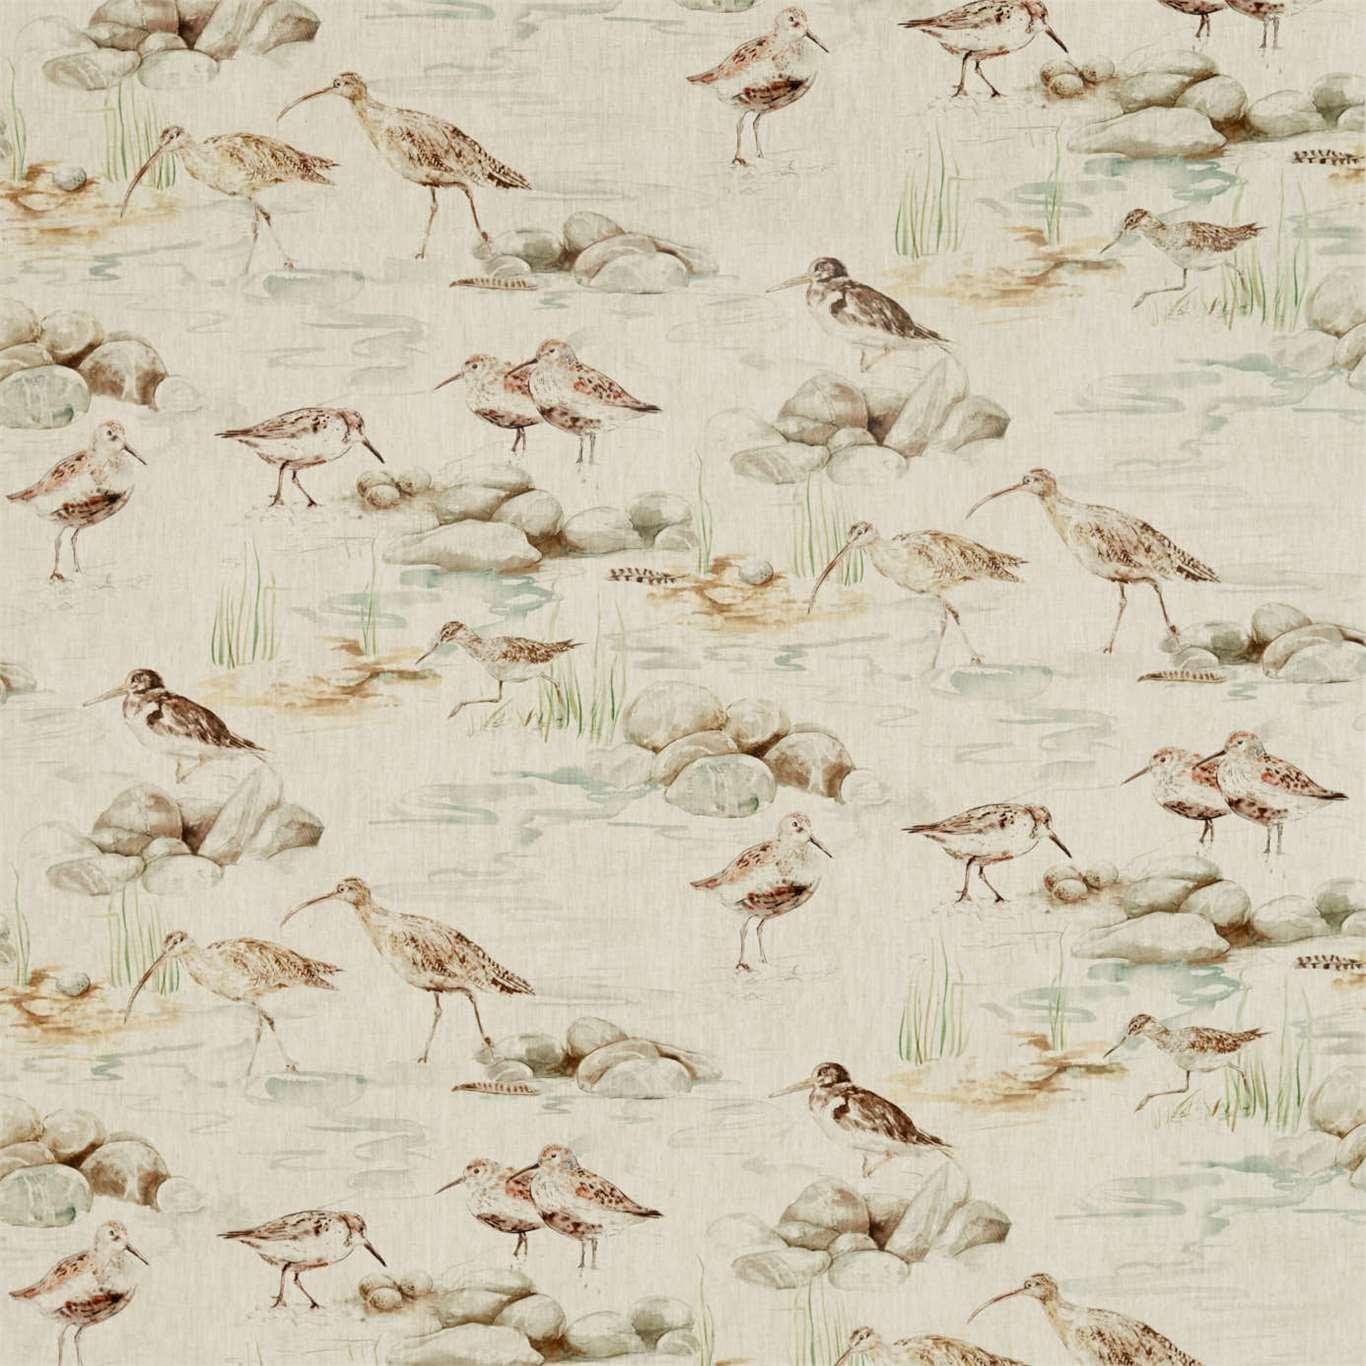 Image of Sanderson Estuary Birds Linen Eggshell/Nest Curtain Fabric 226427